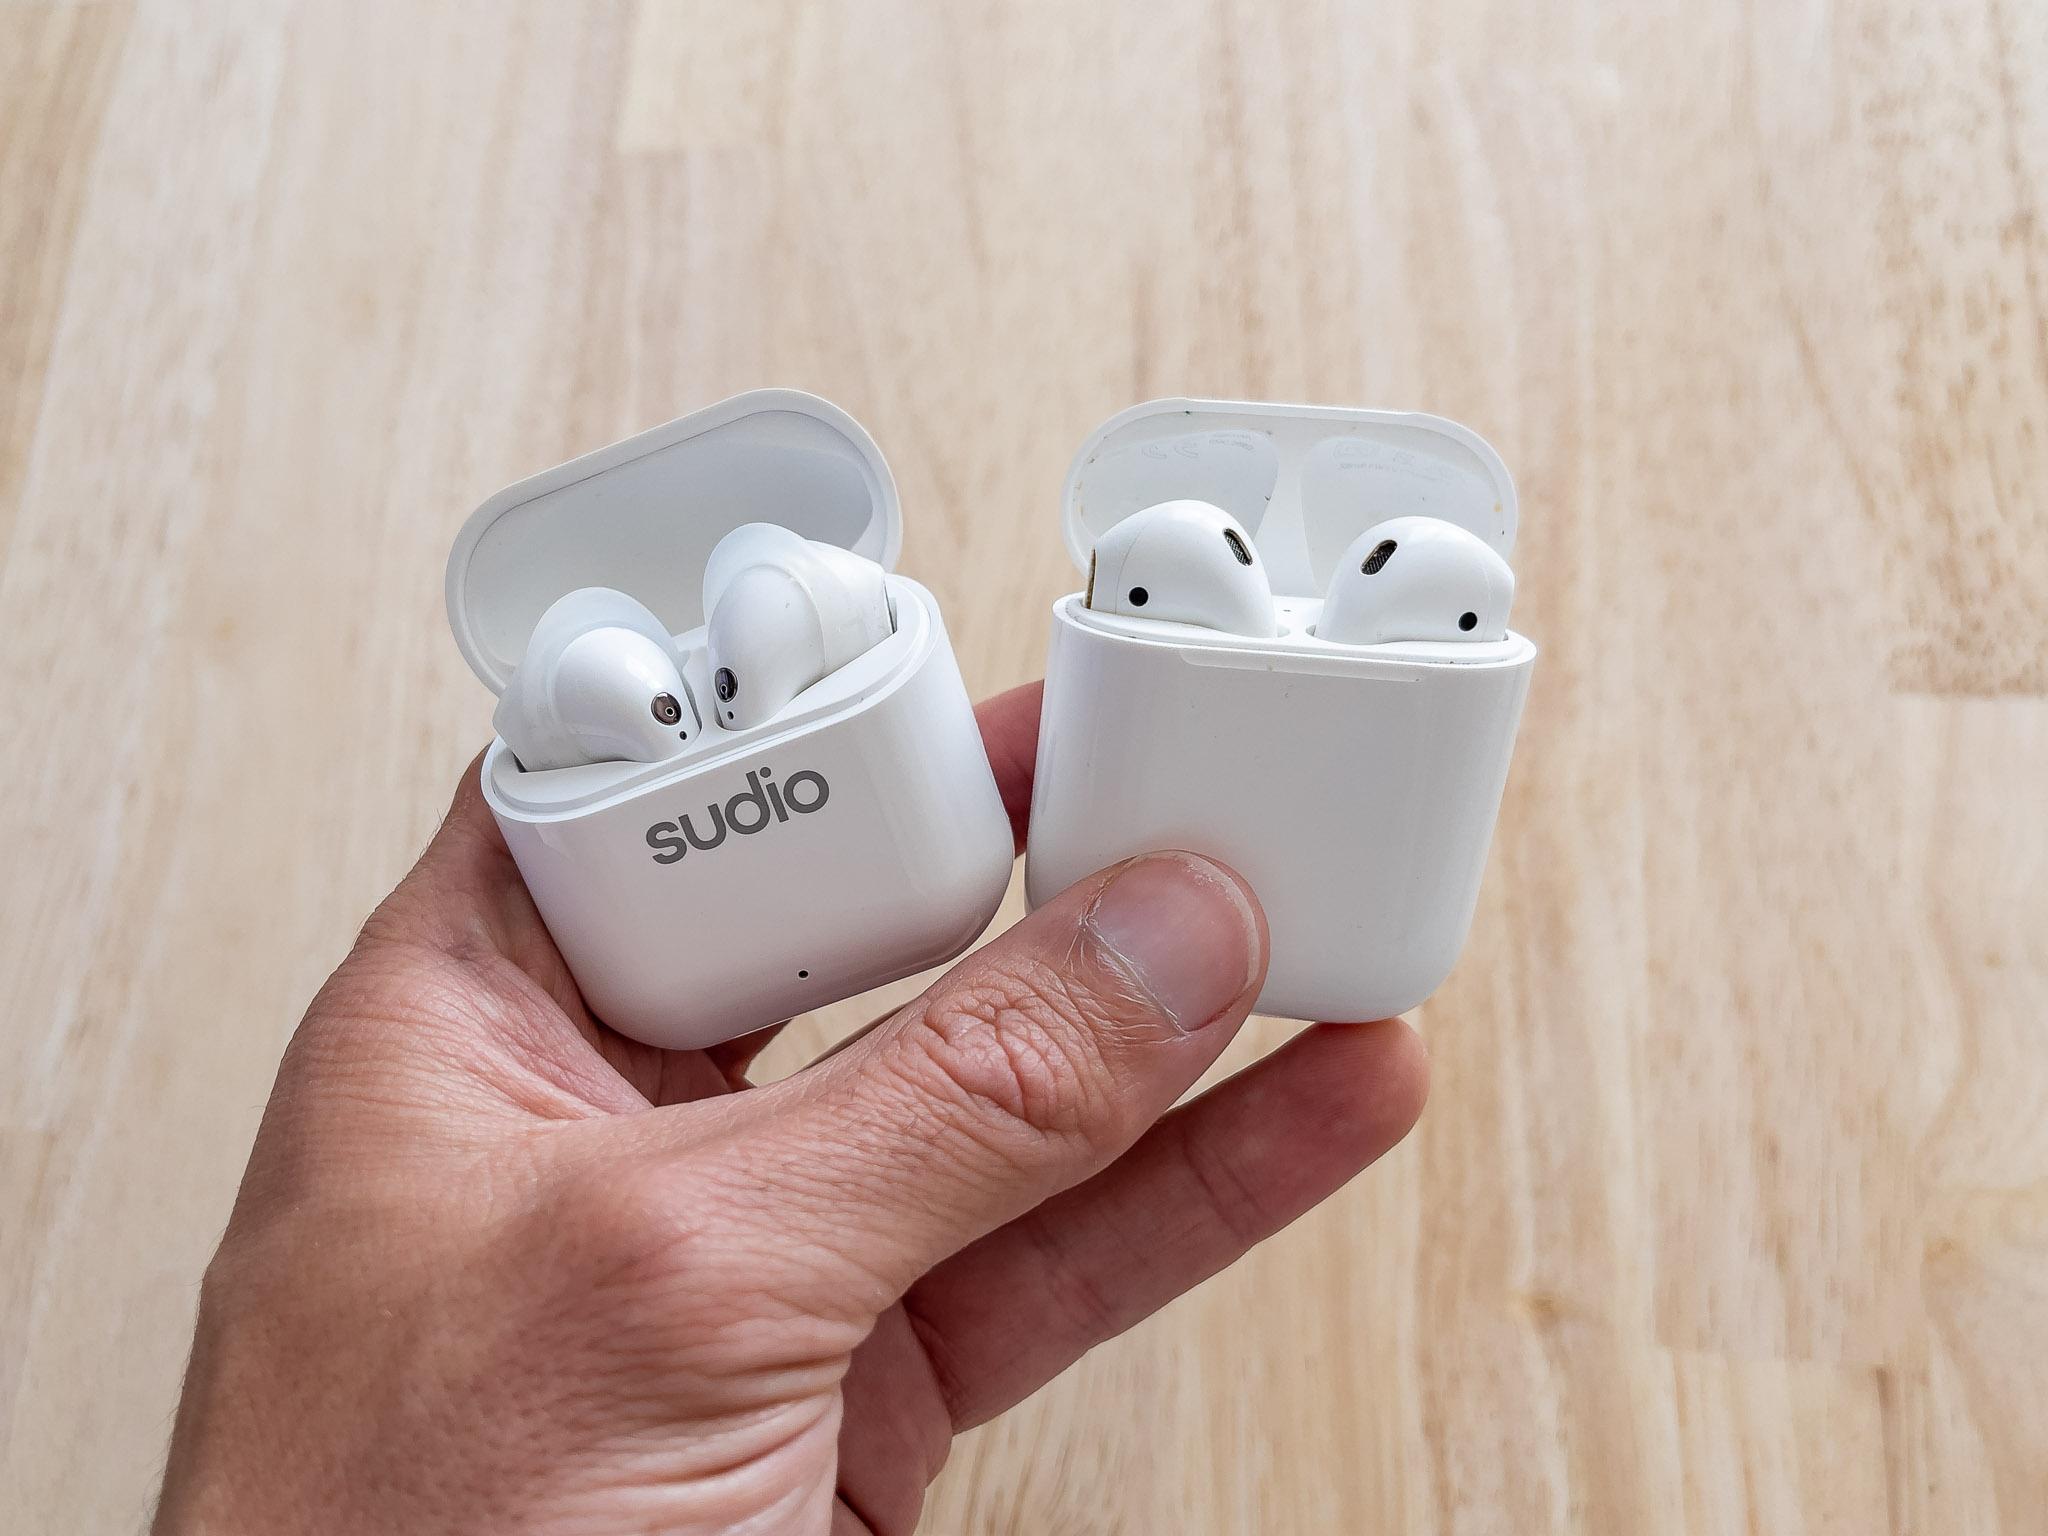 Les Sudio Nio et les AirPods d'Apple